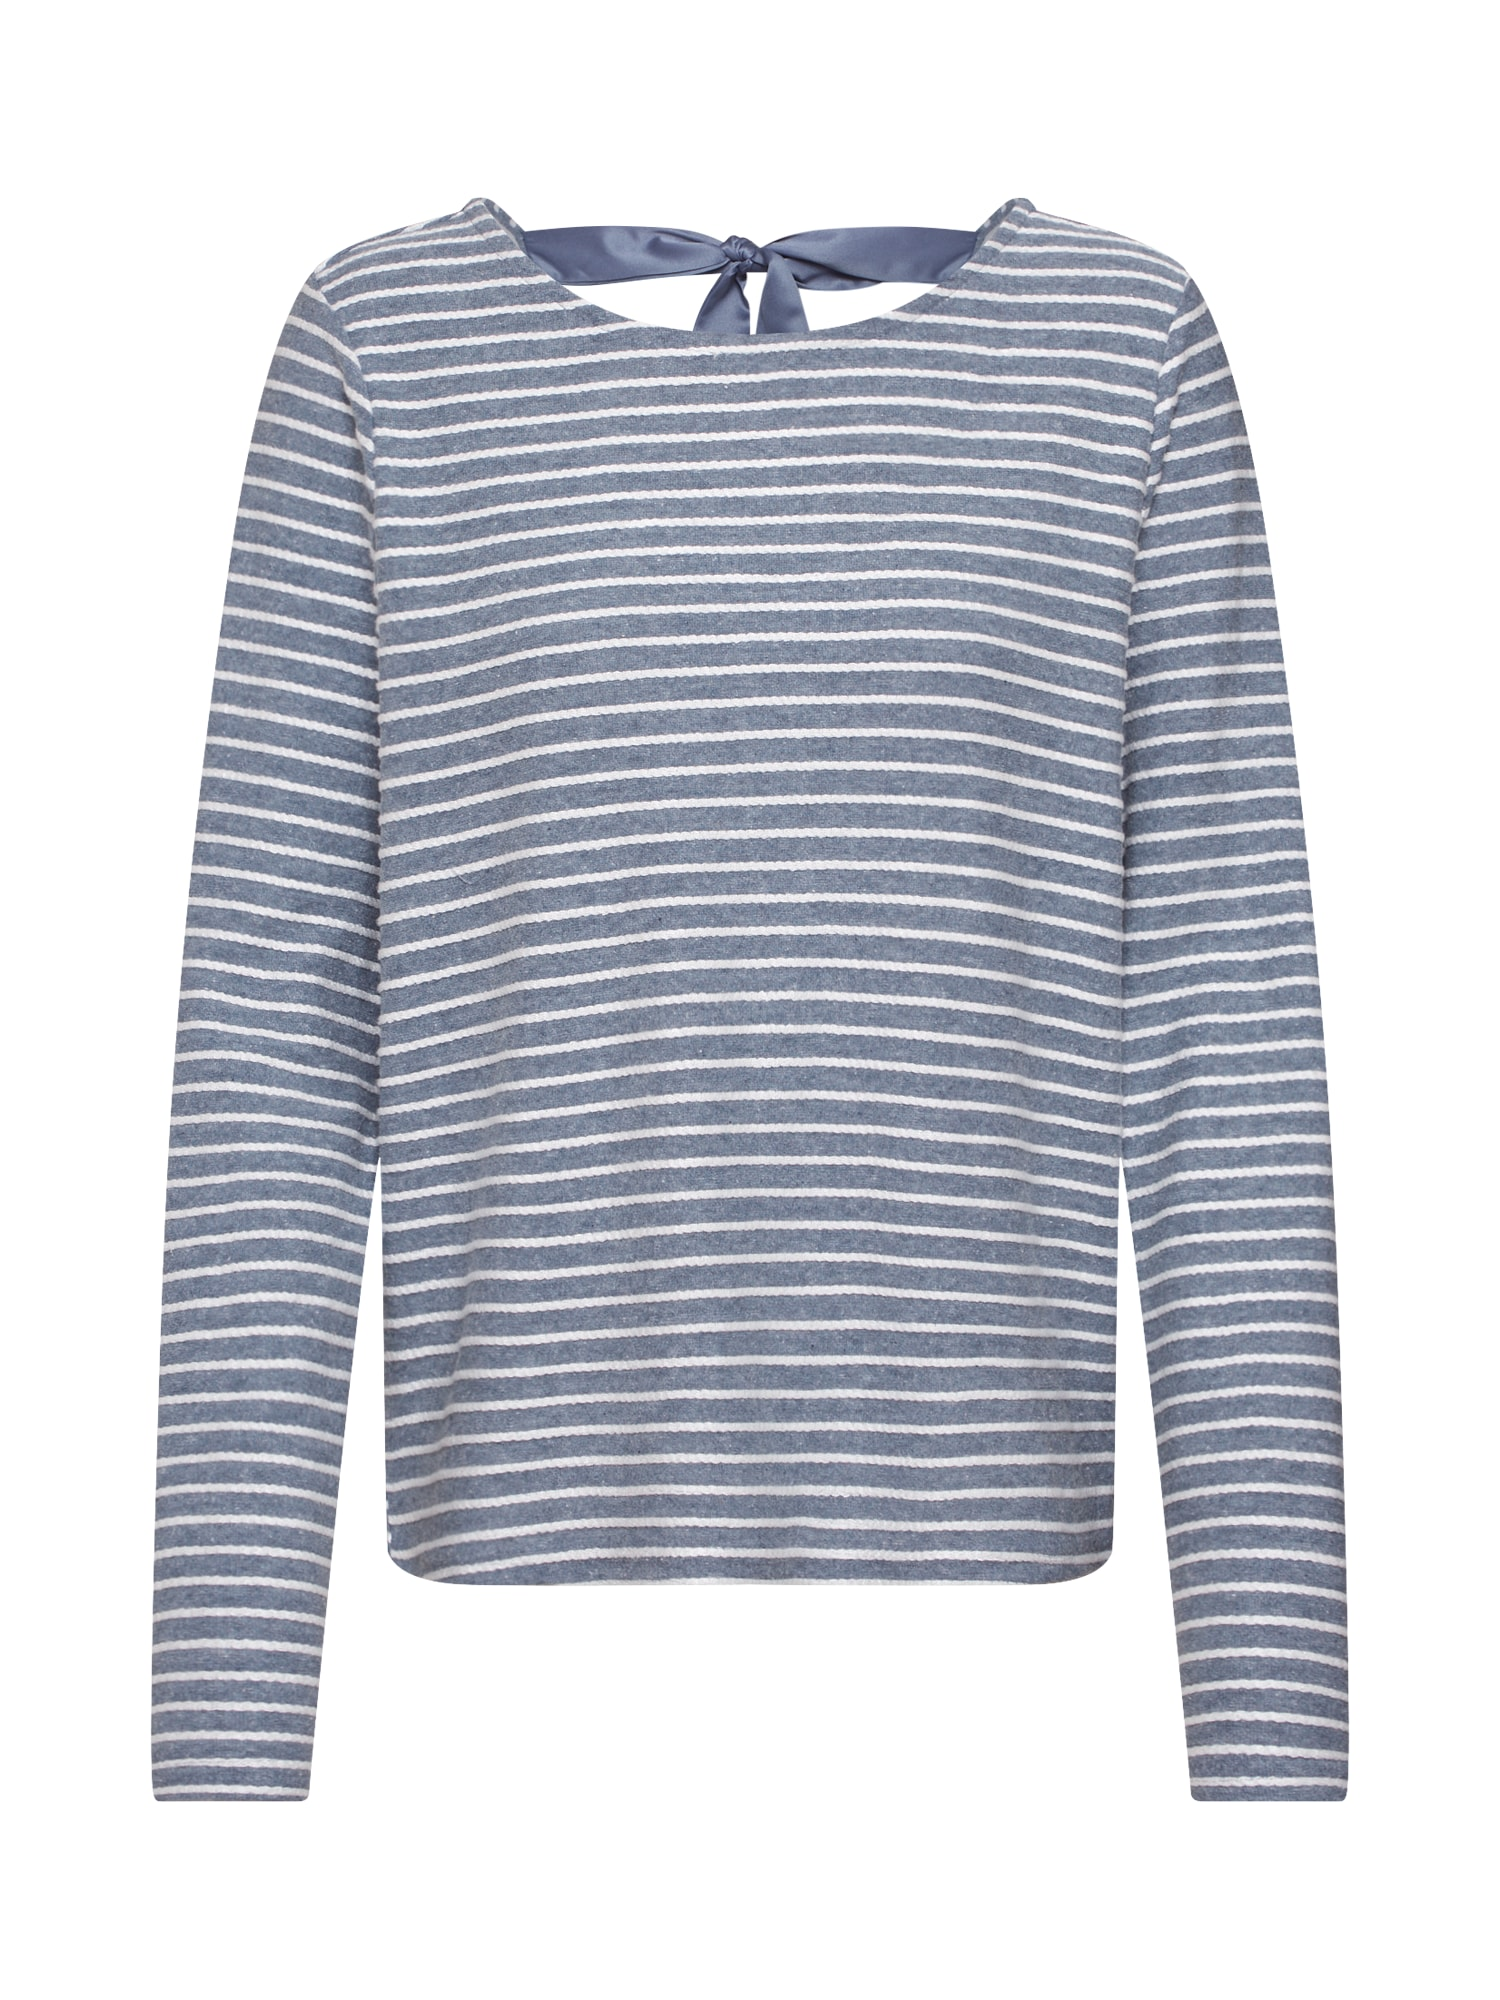 ONLY Megztinis mėlyna / balta